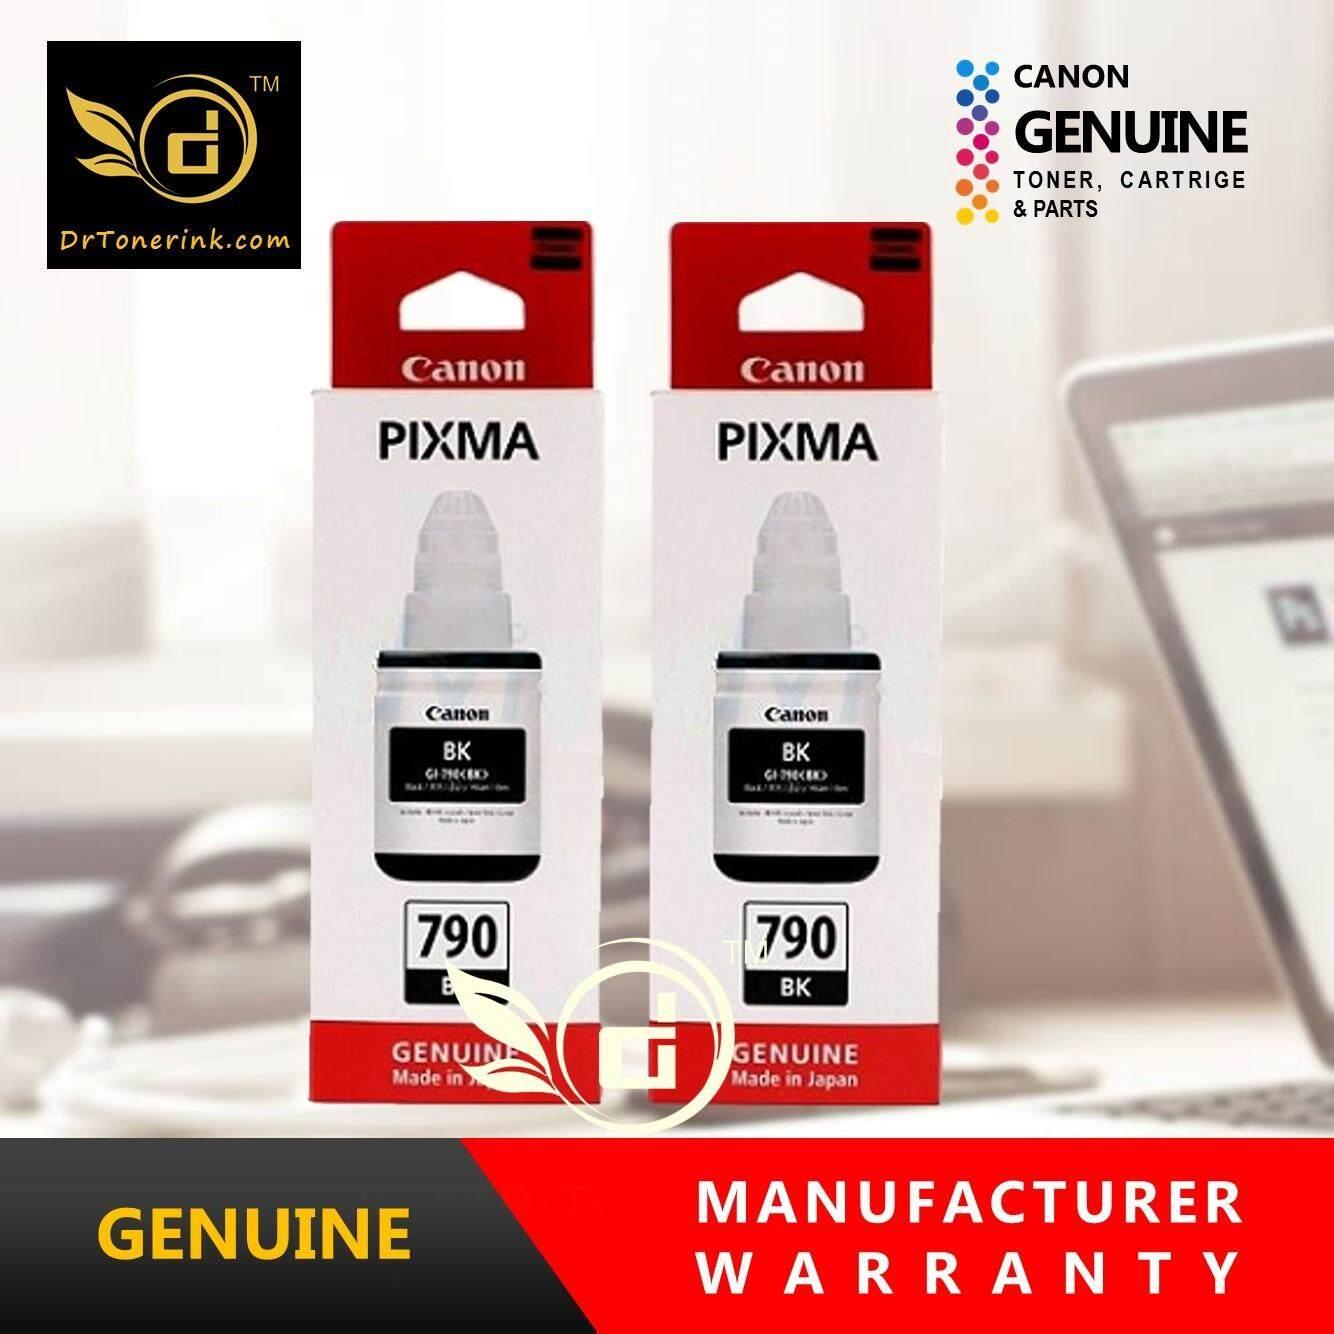 Canon Original Gi 790 Tinta Printer Magenta G1000g2000g2003g300070 Pigment Ultimate Plus Uv G1000 G2000 G2003 G3000 Yellow 70 Ml